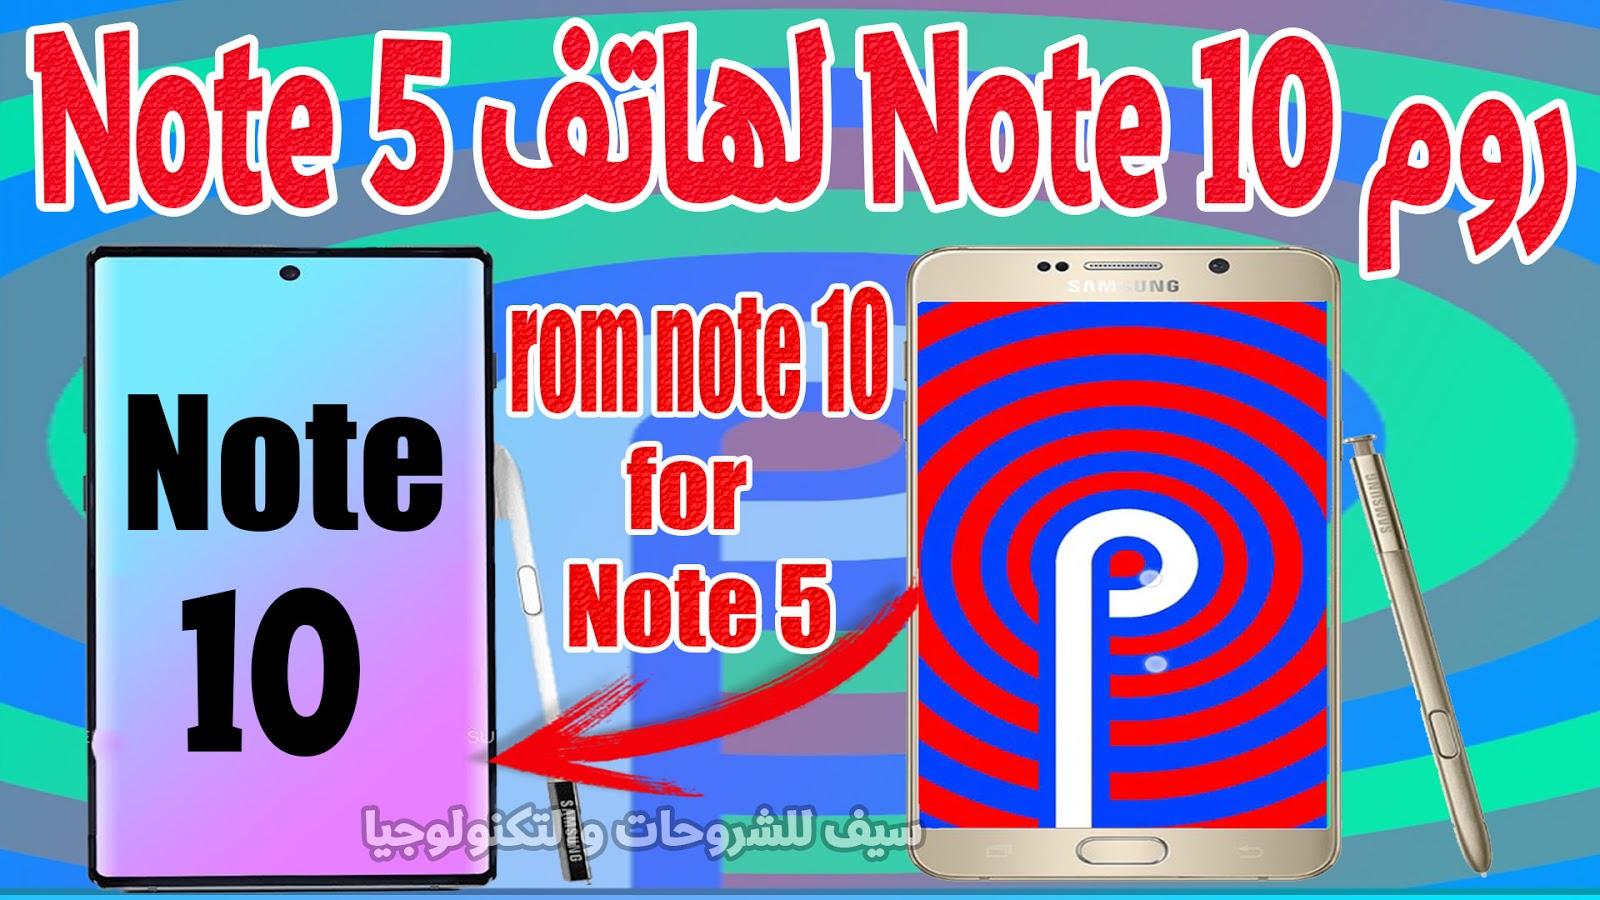 حصريا لأول مرة في المحتوي العربي روم هاتف Note 10 وتركيبها علي هاتف Note 5 - ا rom note 10 for note 5